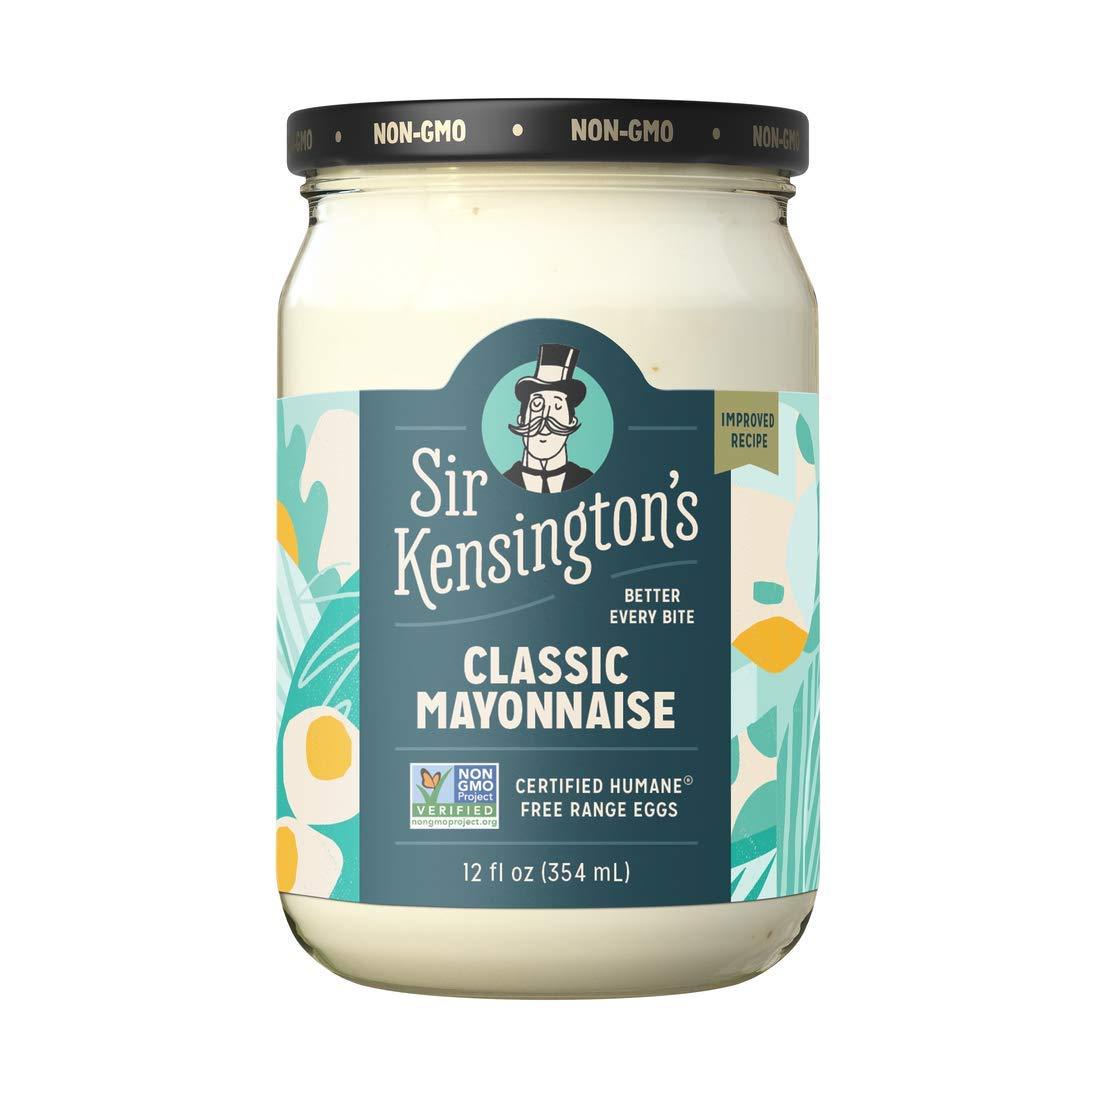 Sir Kensington's Mayonnaise Classic Mayo Gluten Free